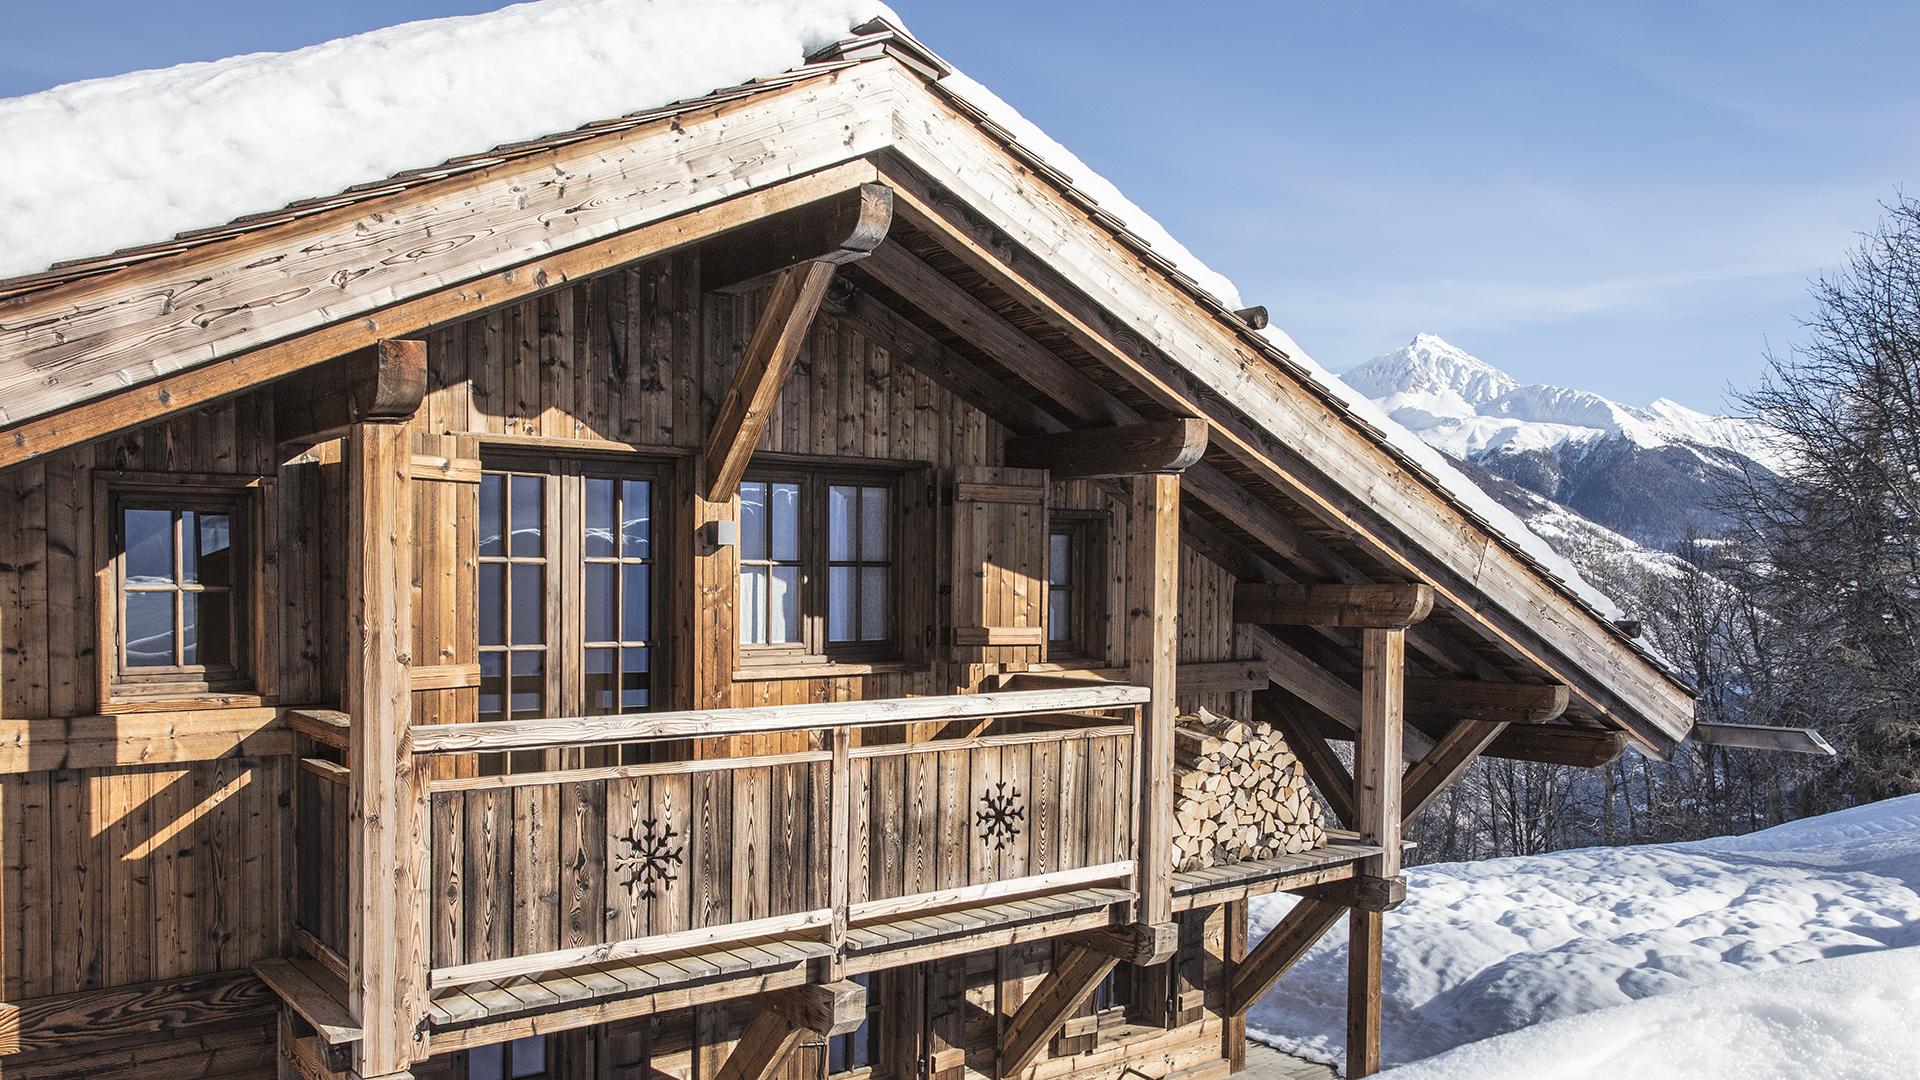 Le Loup Blanc Chalet, Switzerland